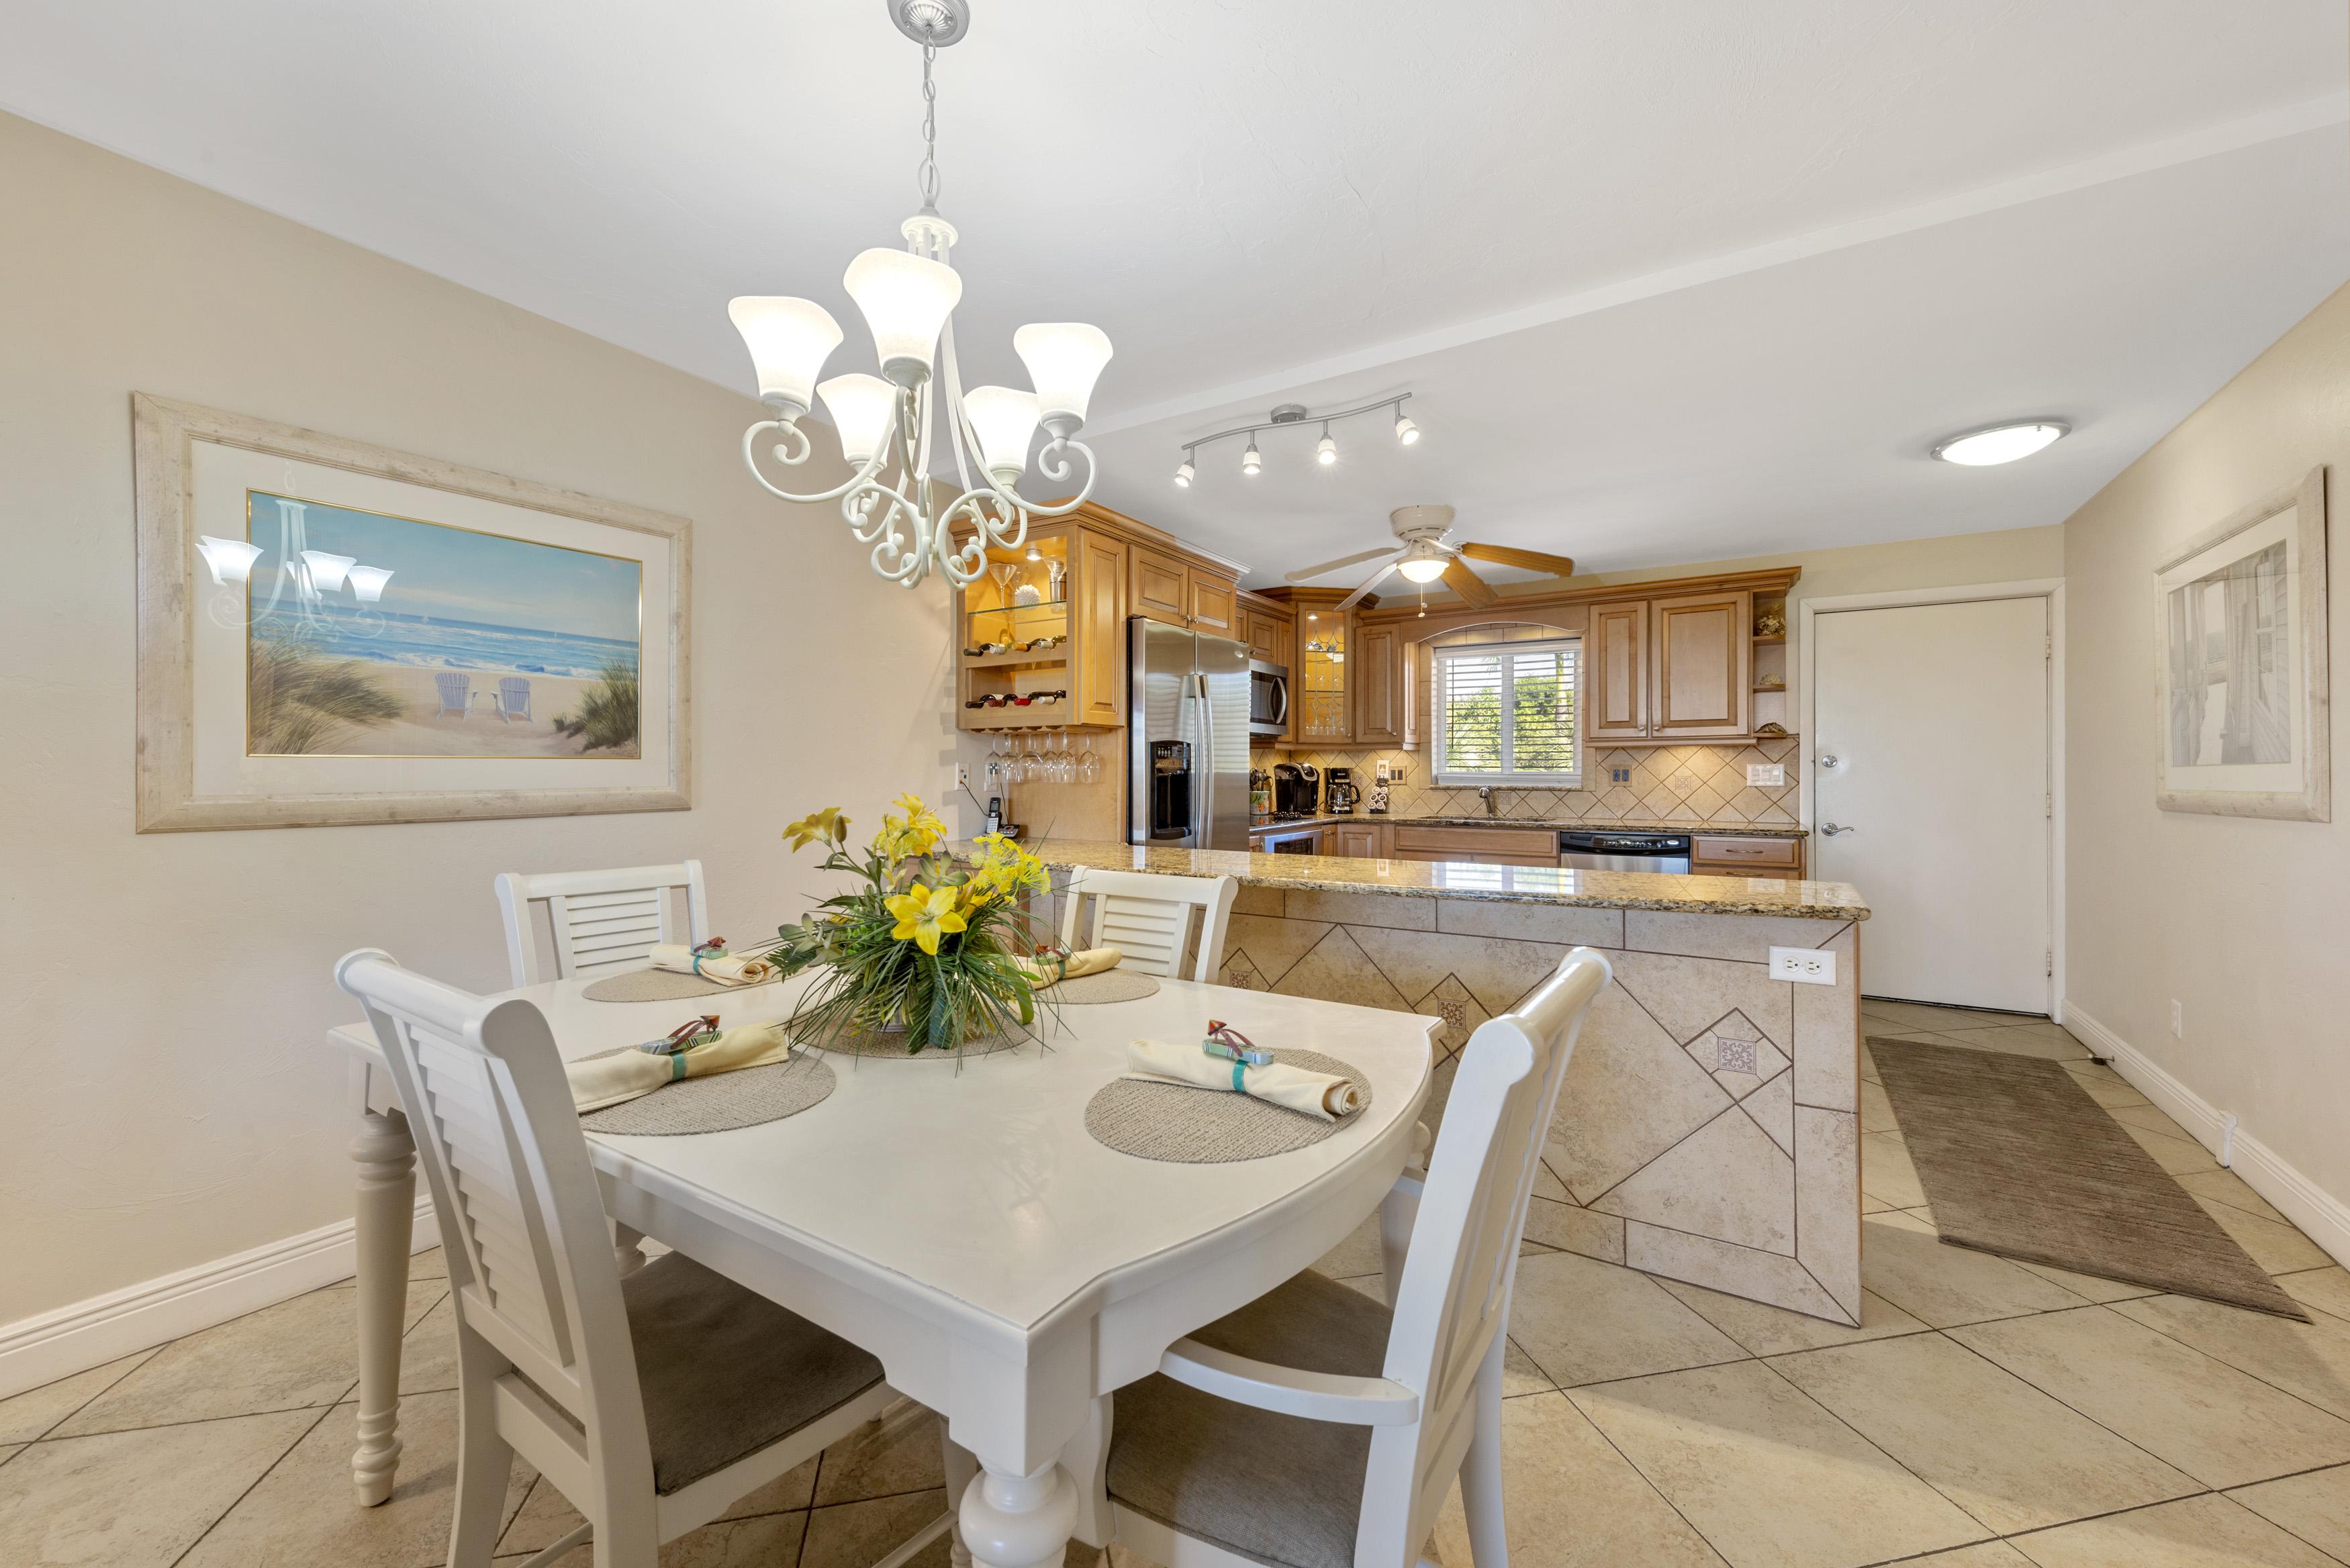 Sanibel Island Rental Condo Kitchen